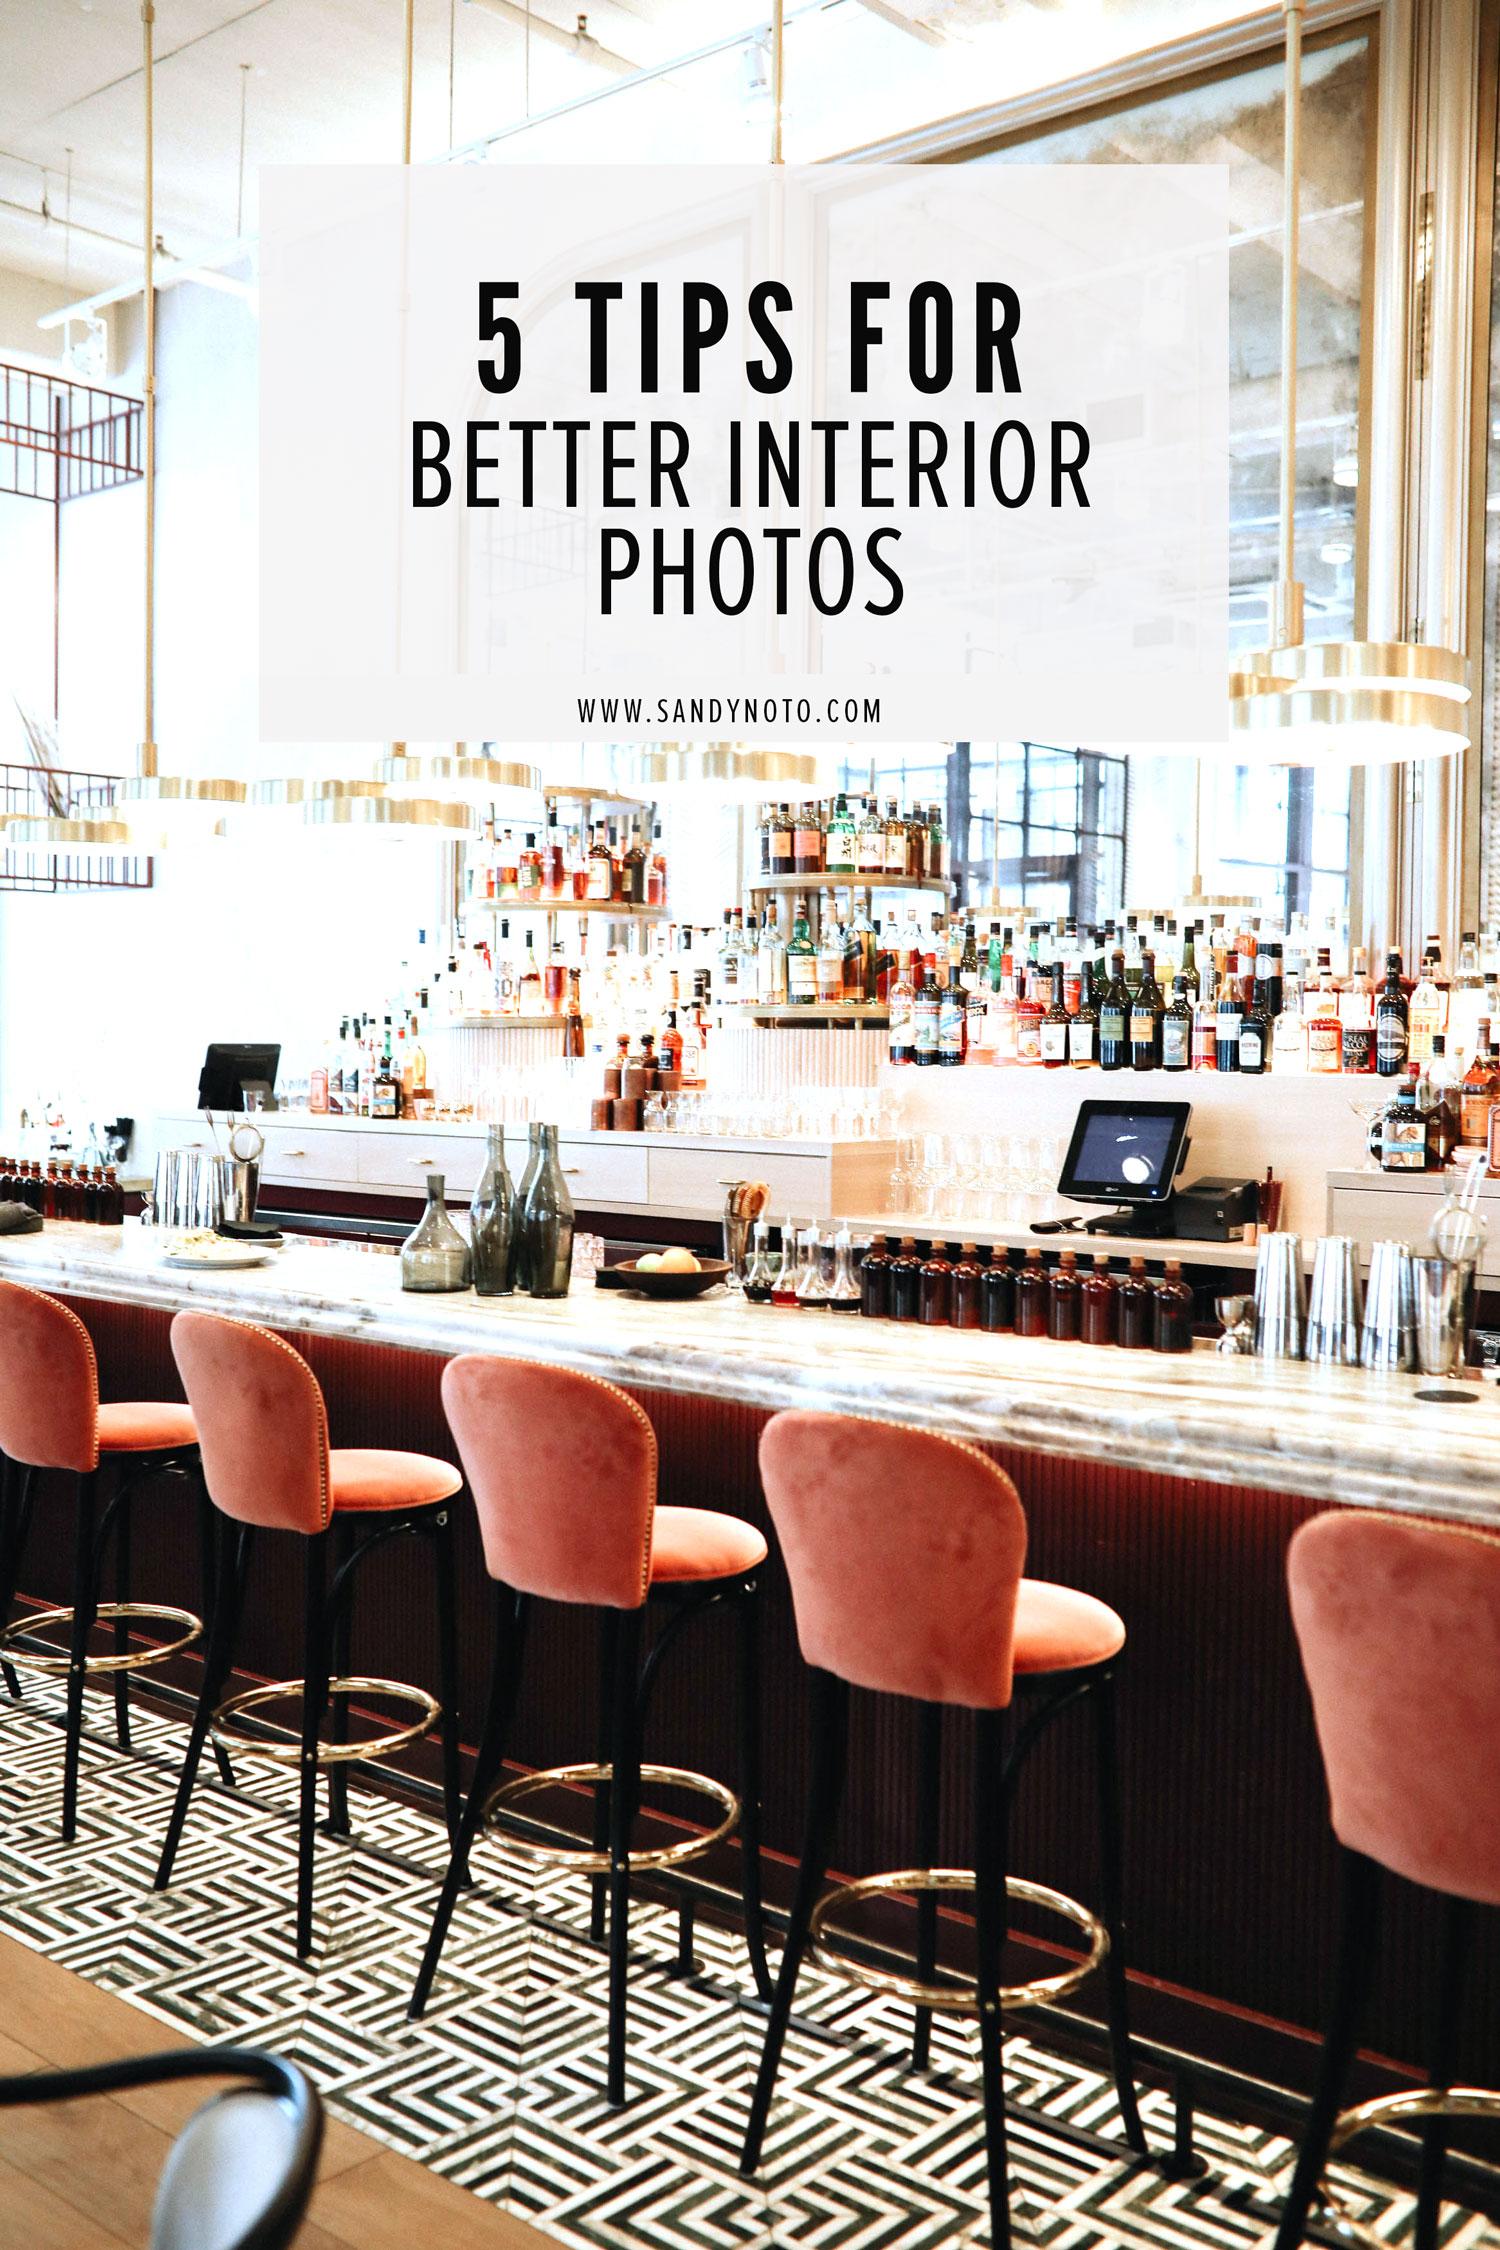 5 Tips for Better Interior Photos